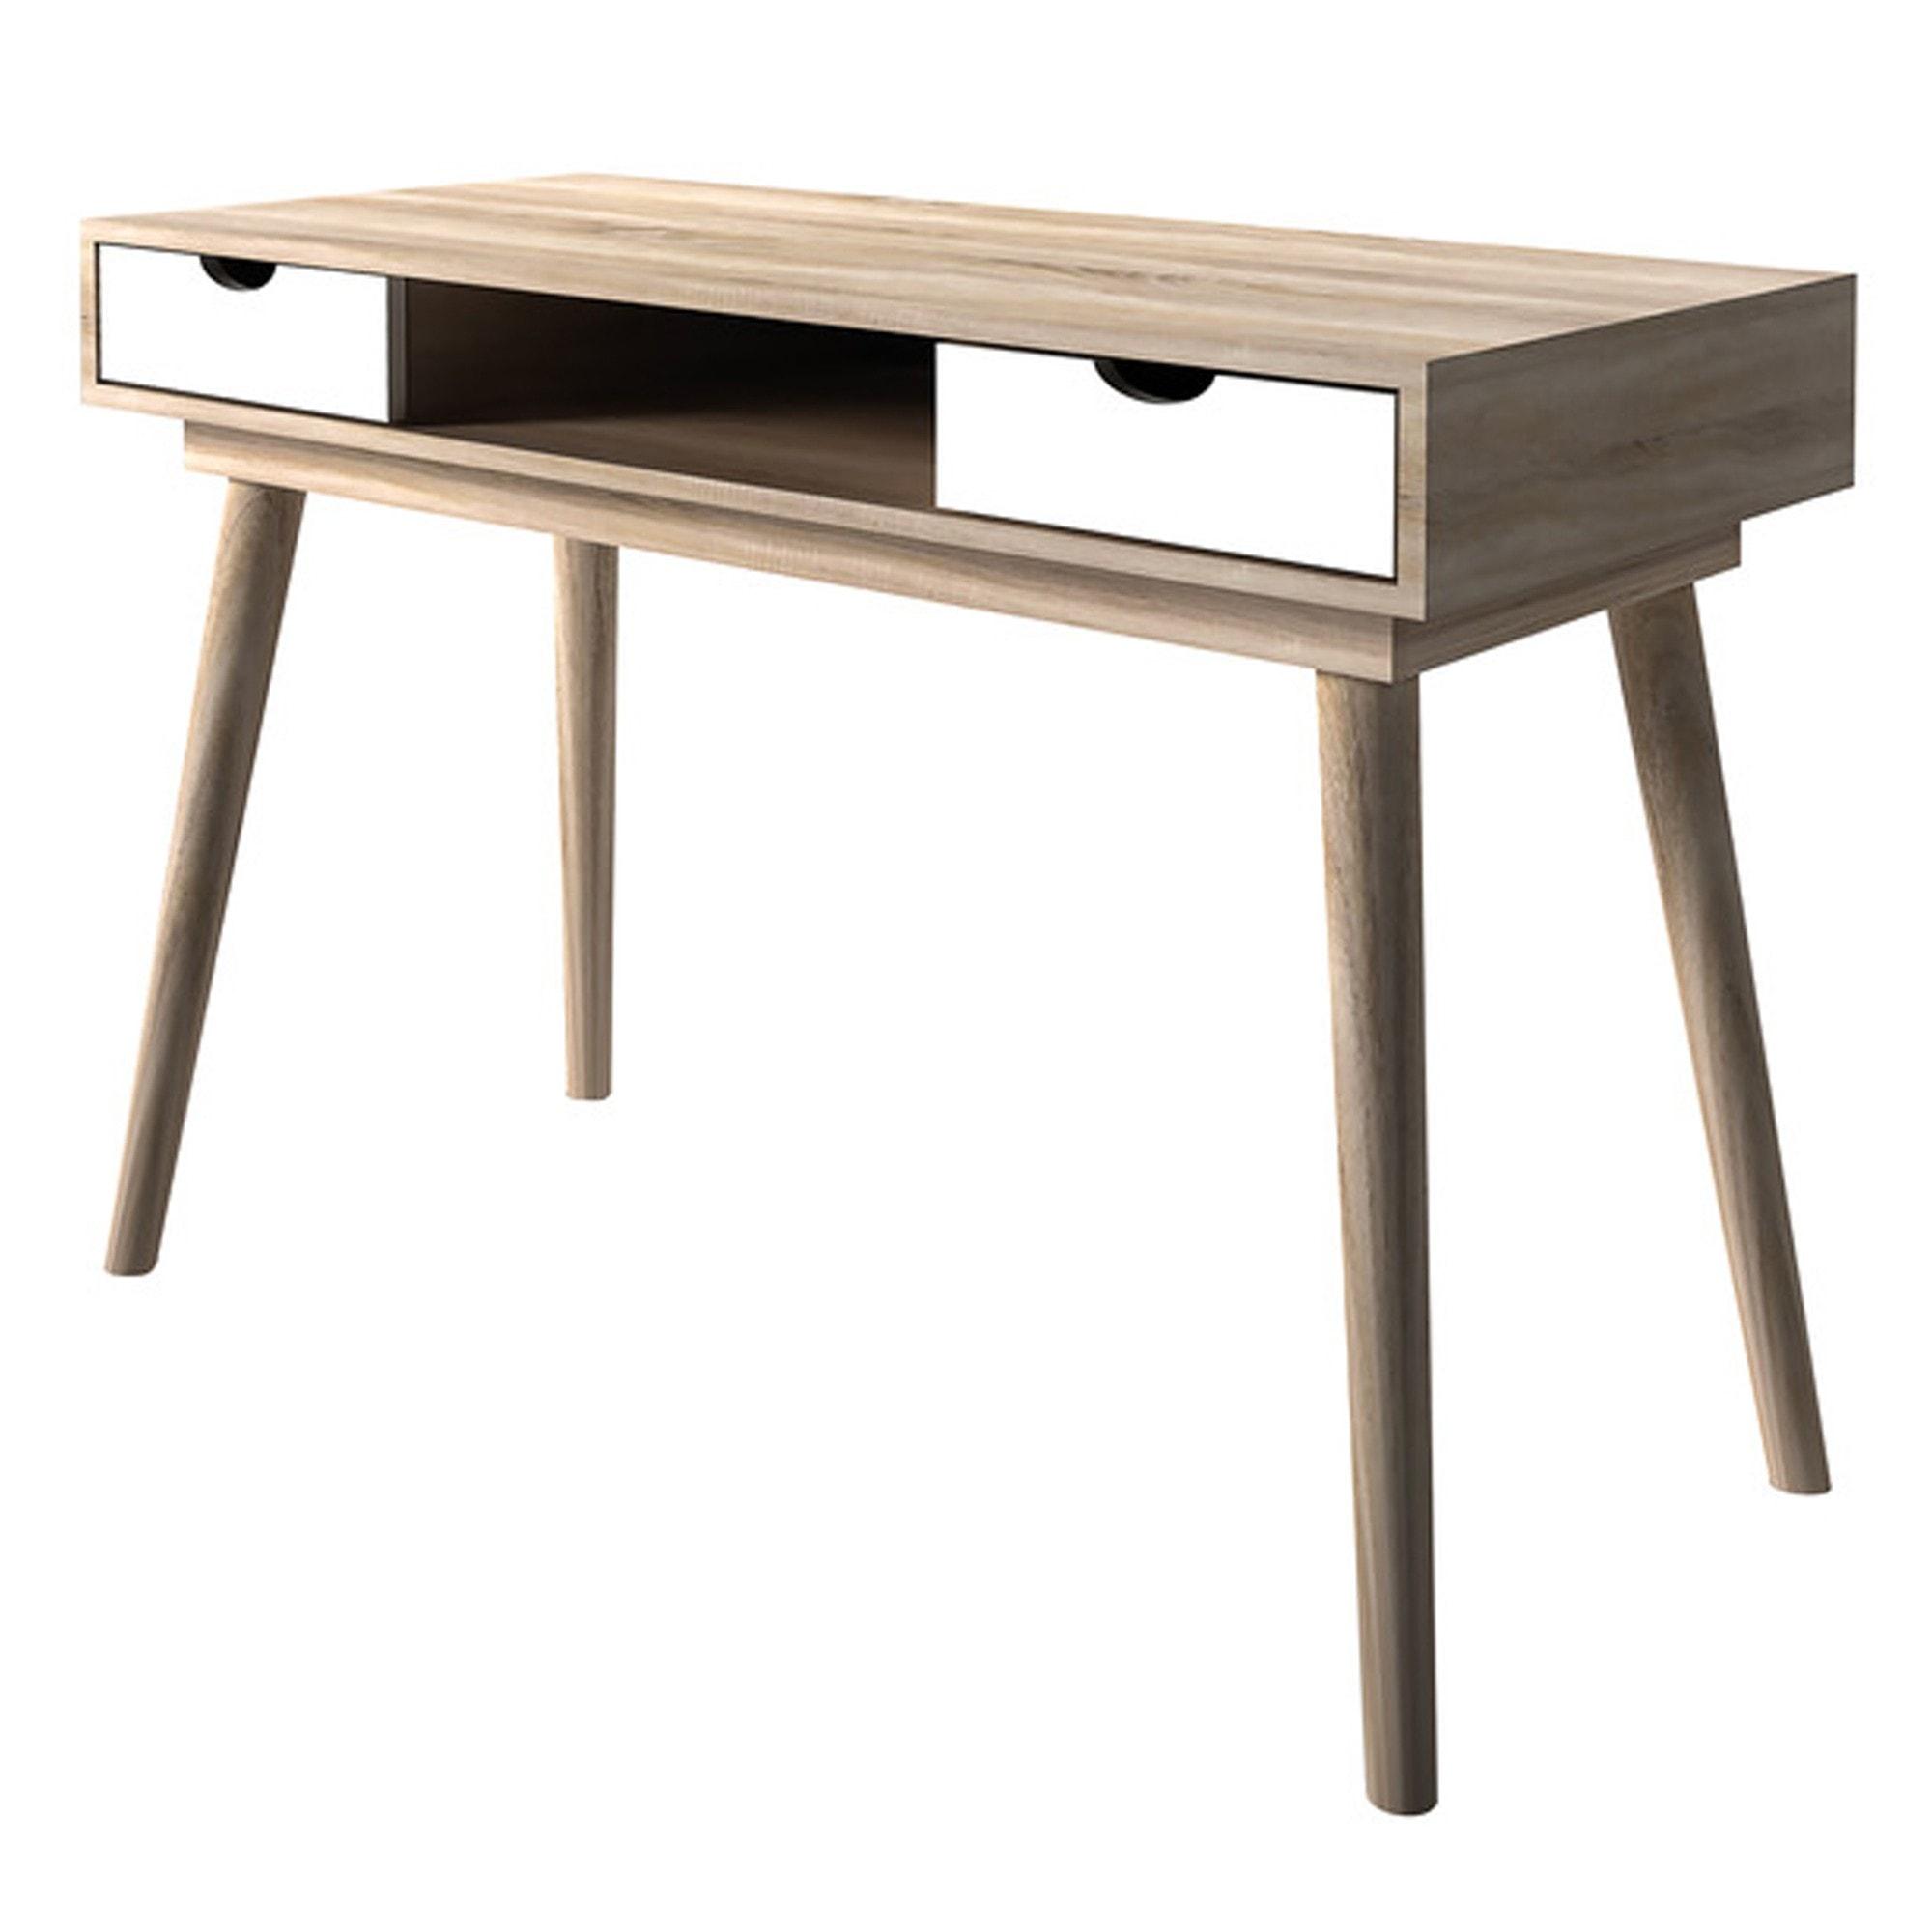 Scandi Wooden Desk Wooden Desk White Wooden Desk